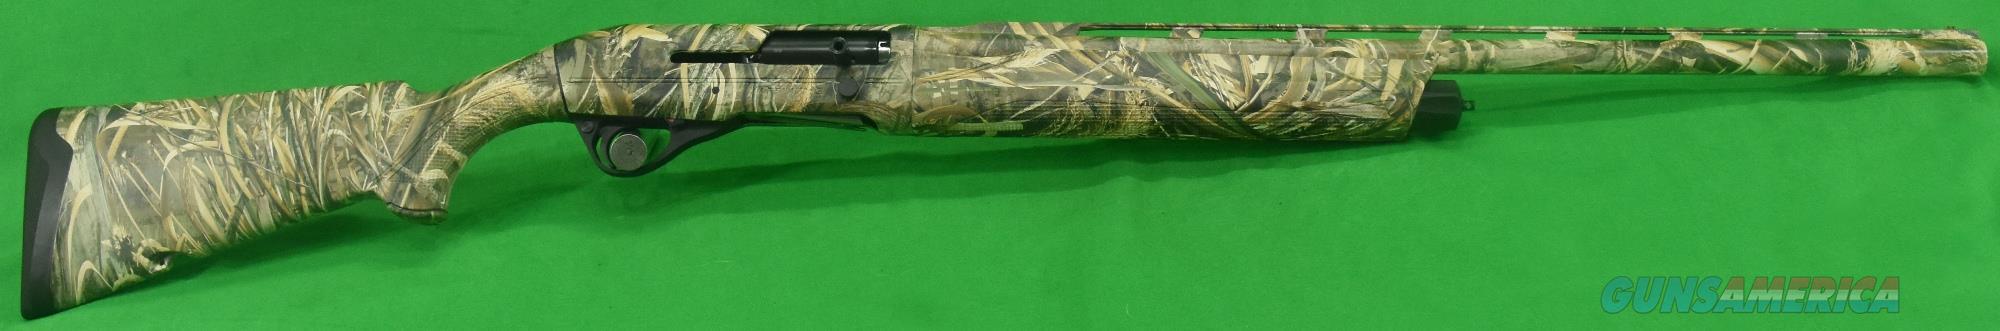 Affinity 3 Max 5 12Ga 26-3In 41040  Guns